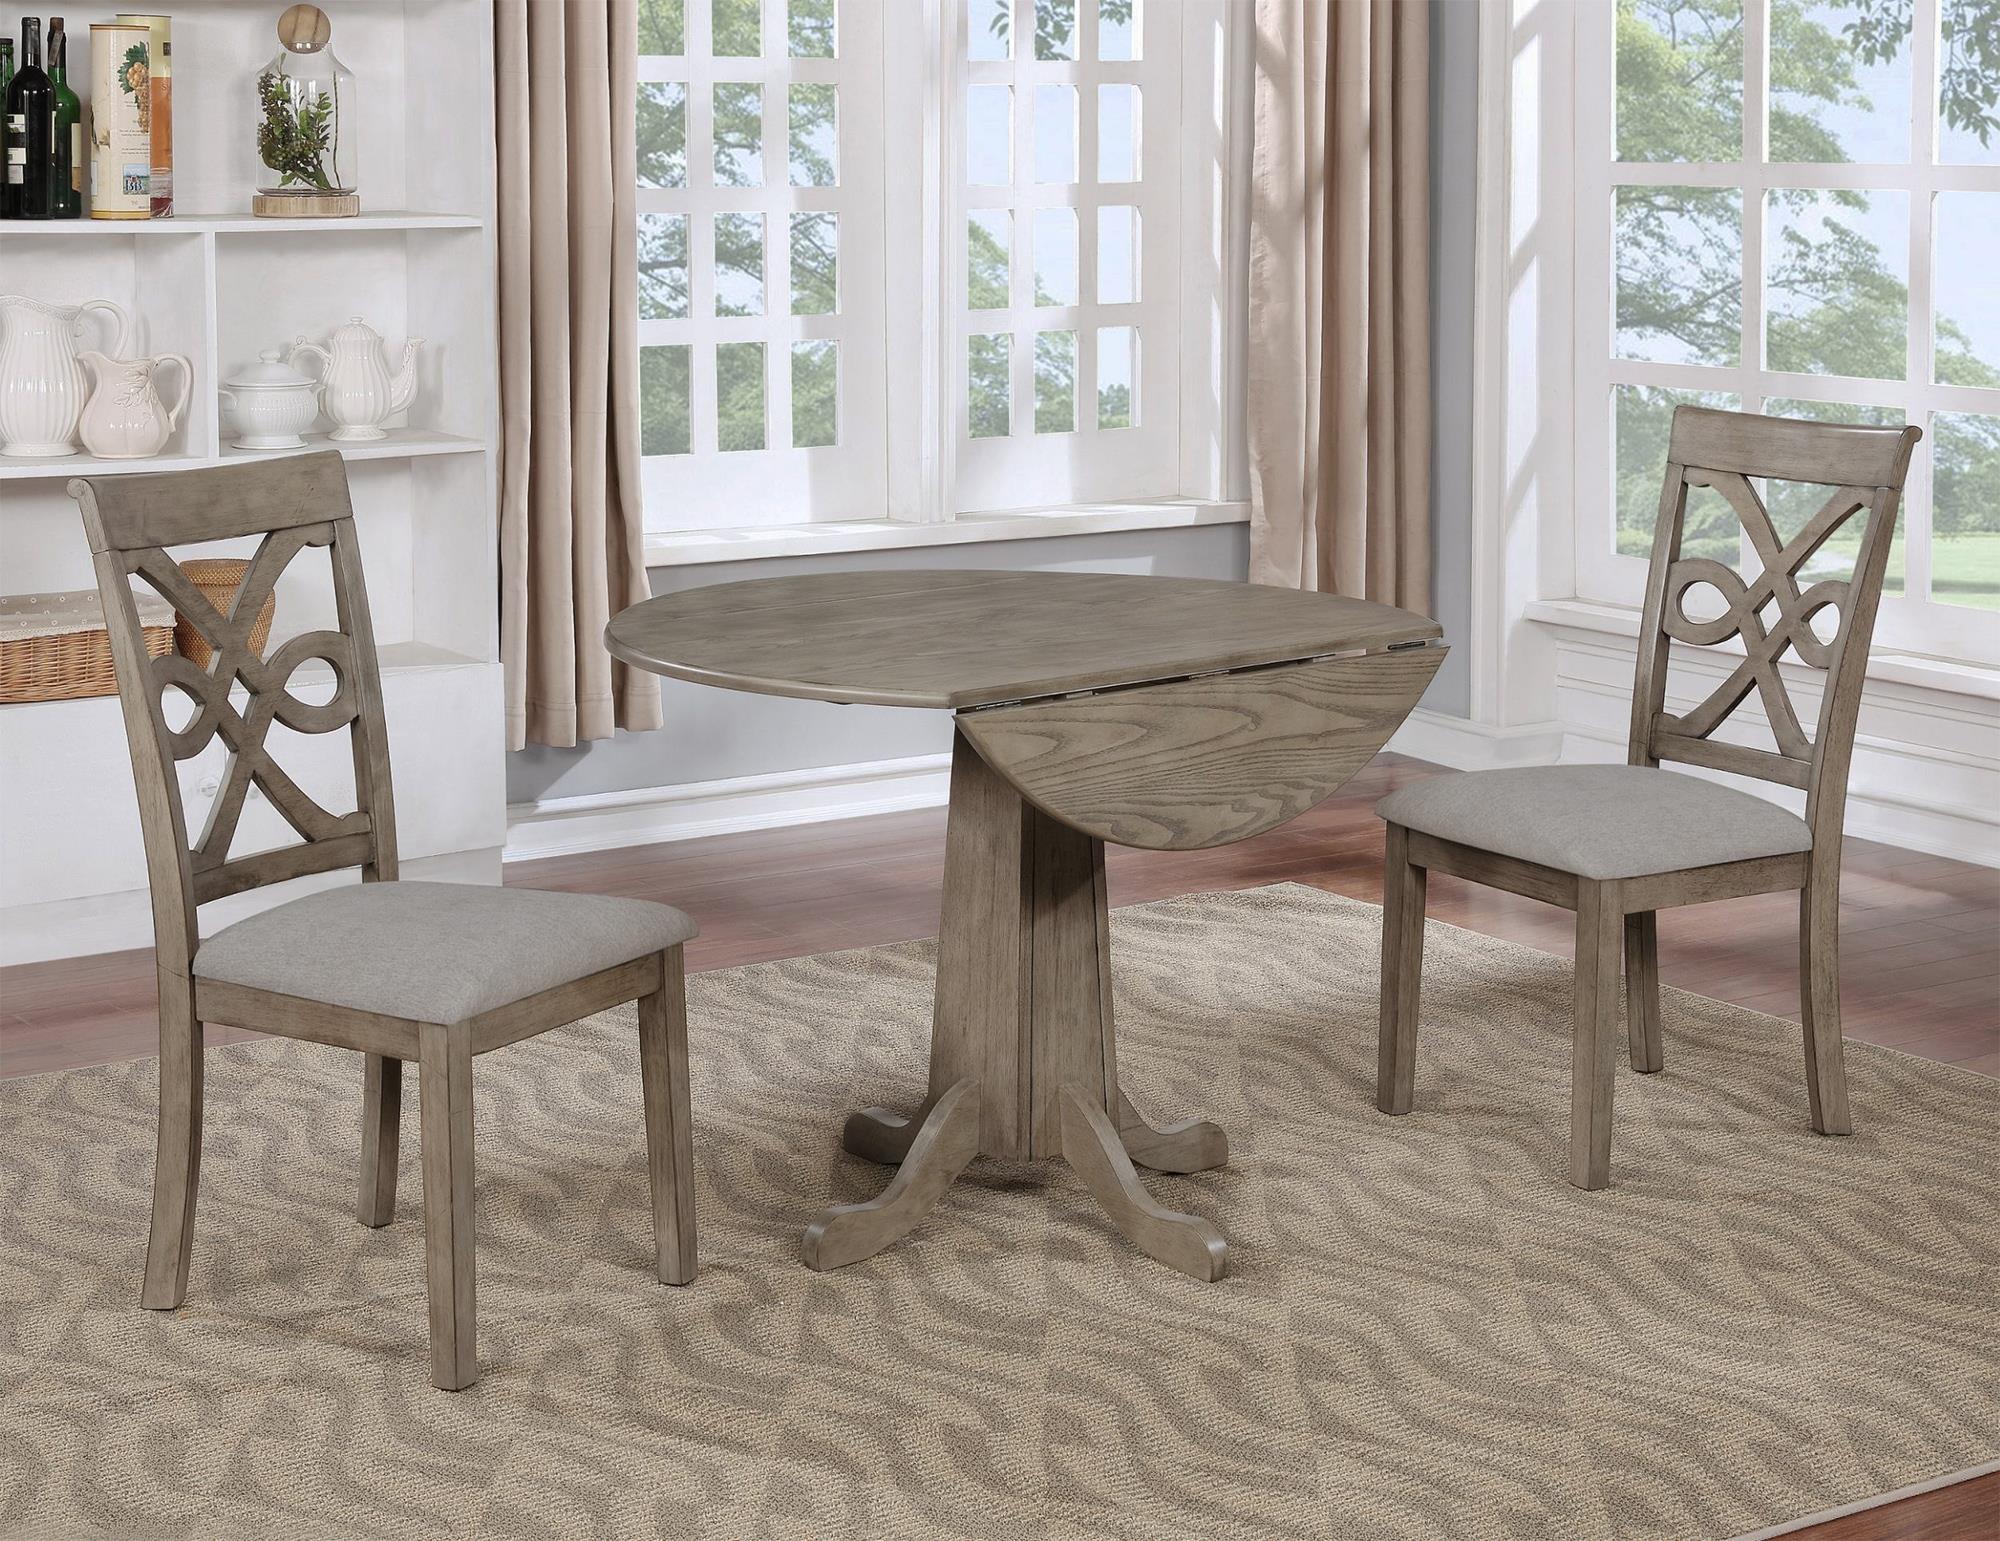 Charmont 3PC Drop-Leaf Table & Chair Set at Rotmans